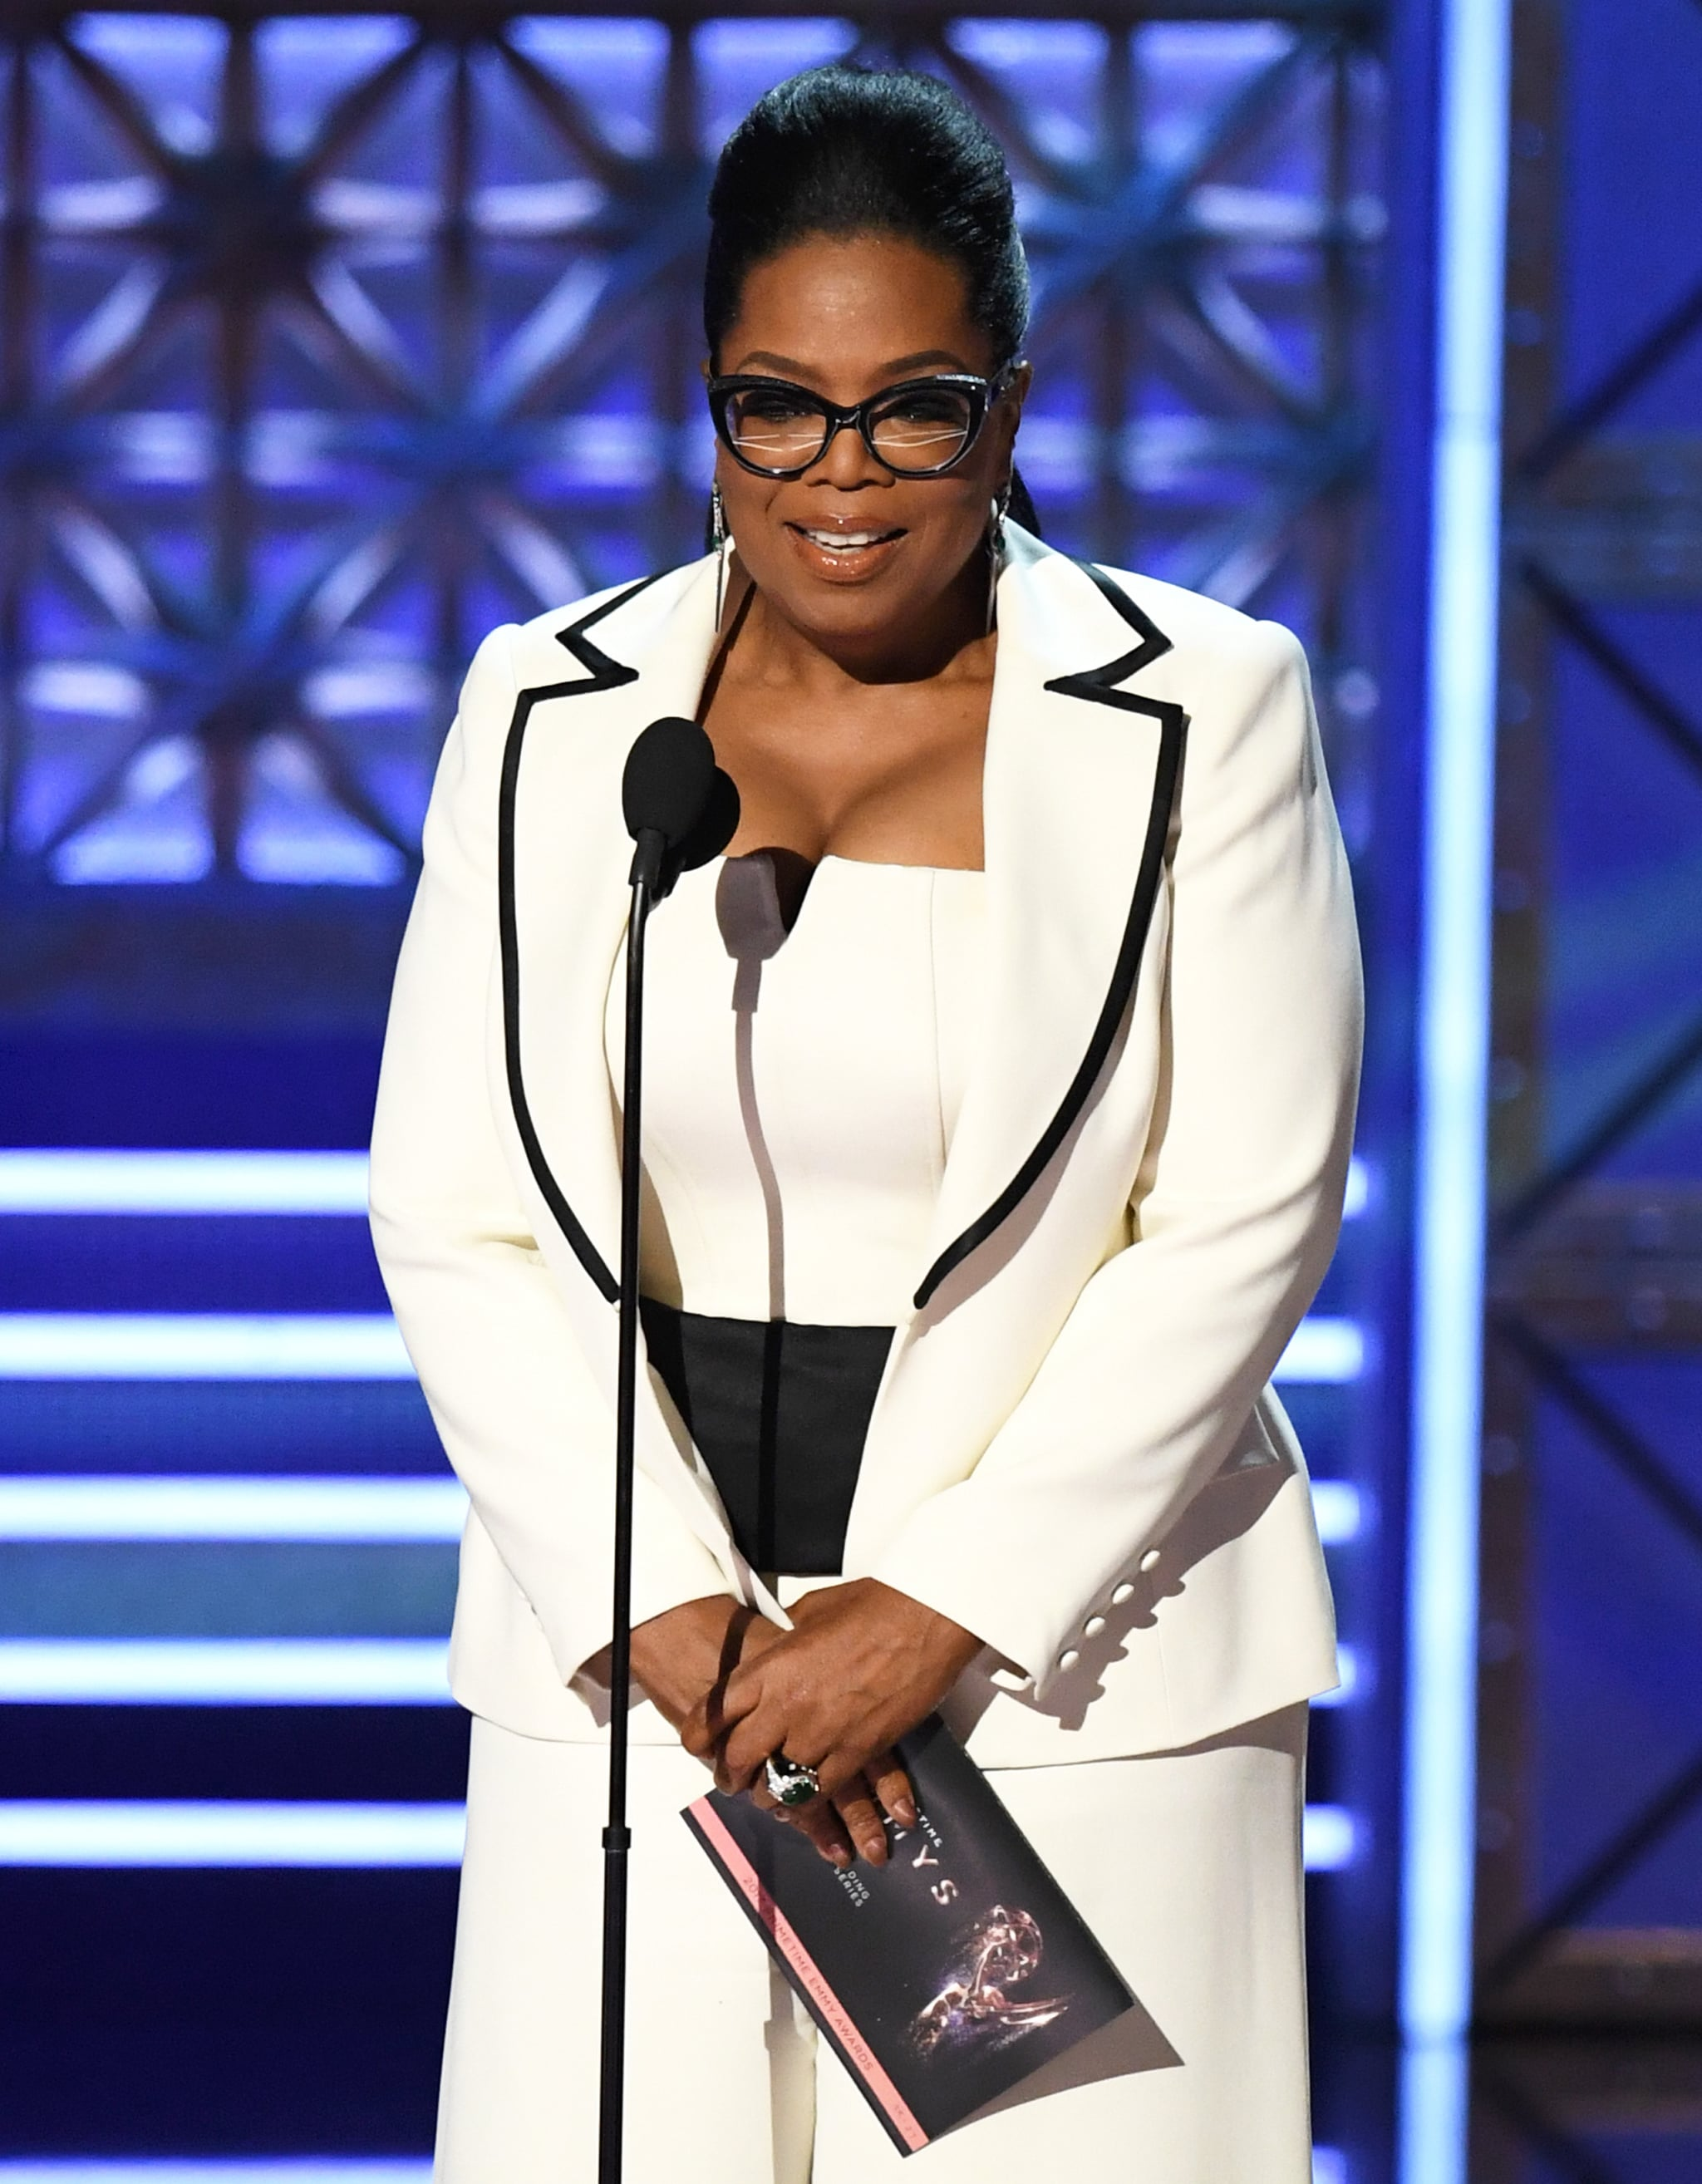 Nude oprah winfrey Oprah Winfrey